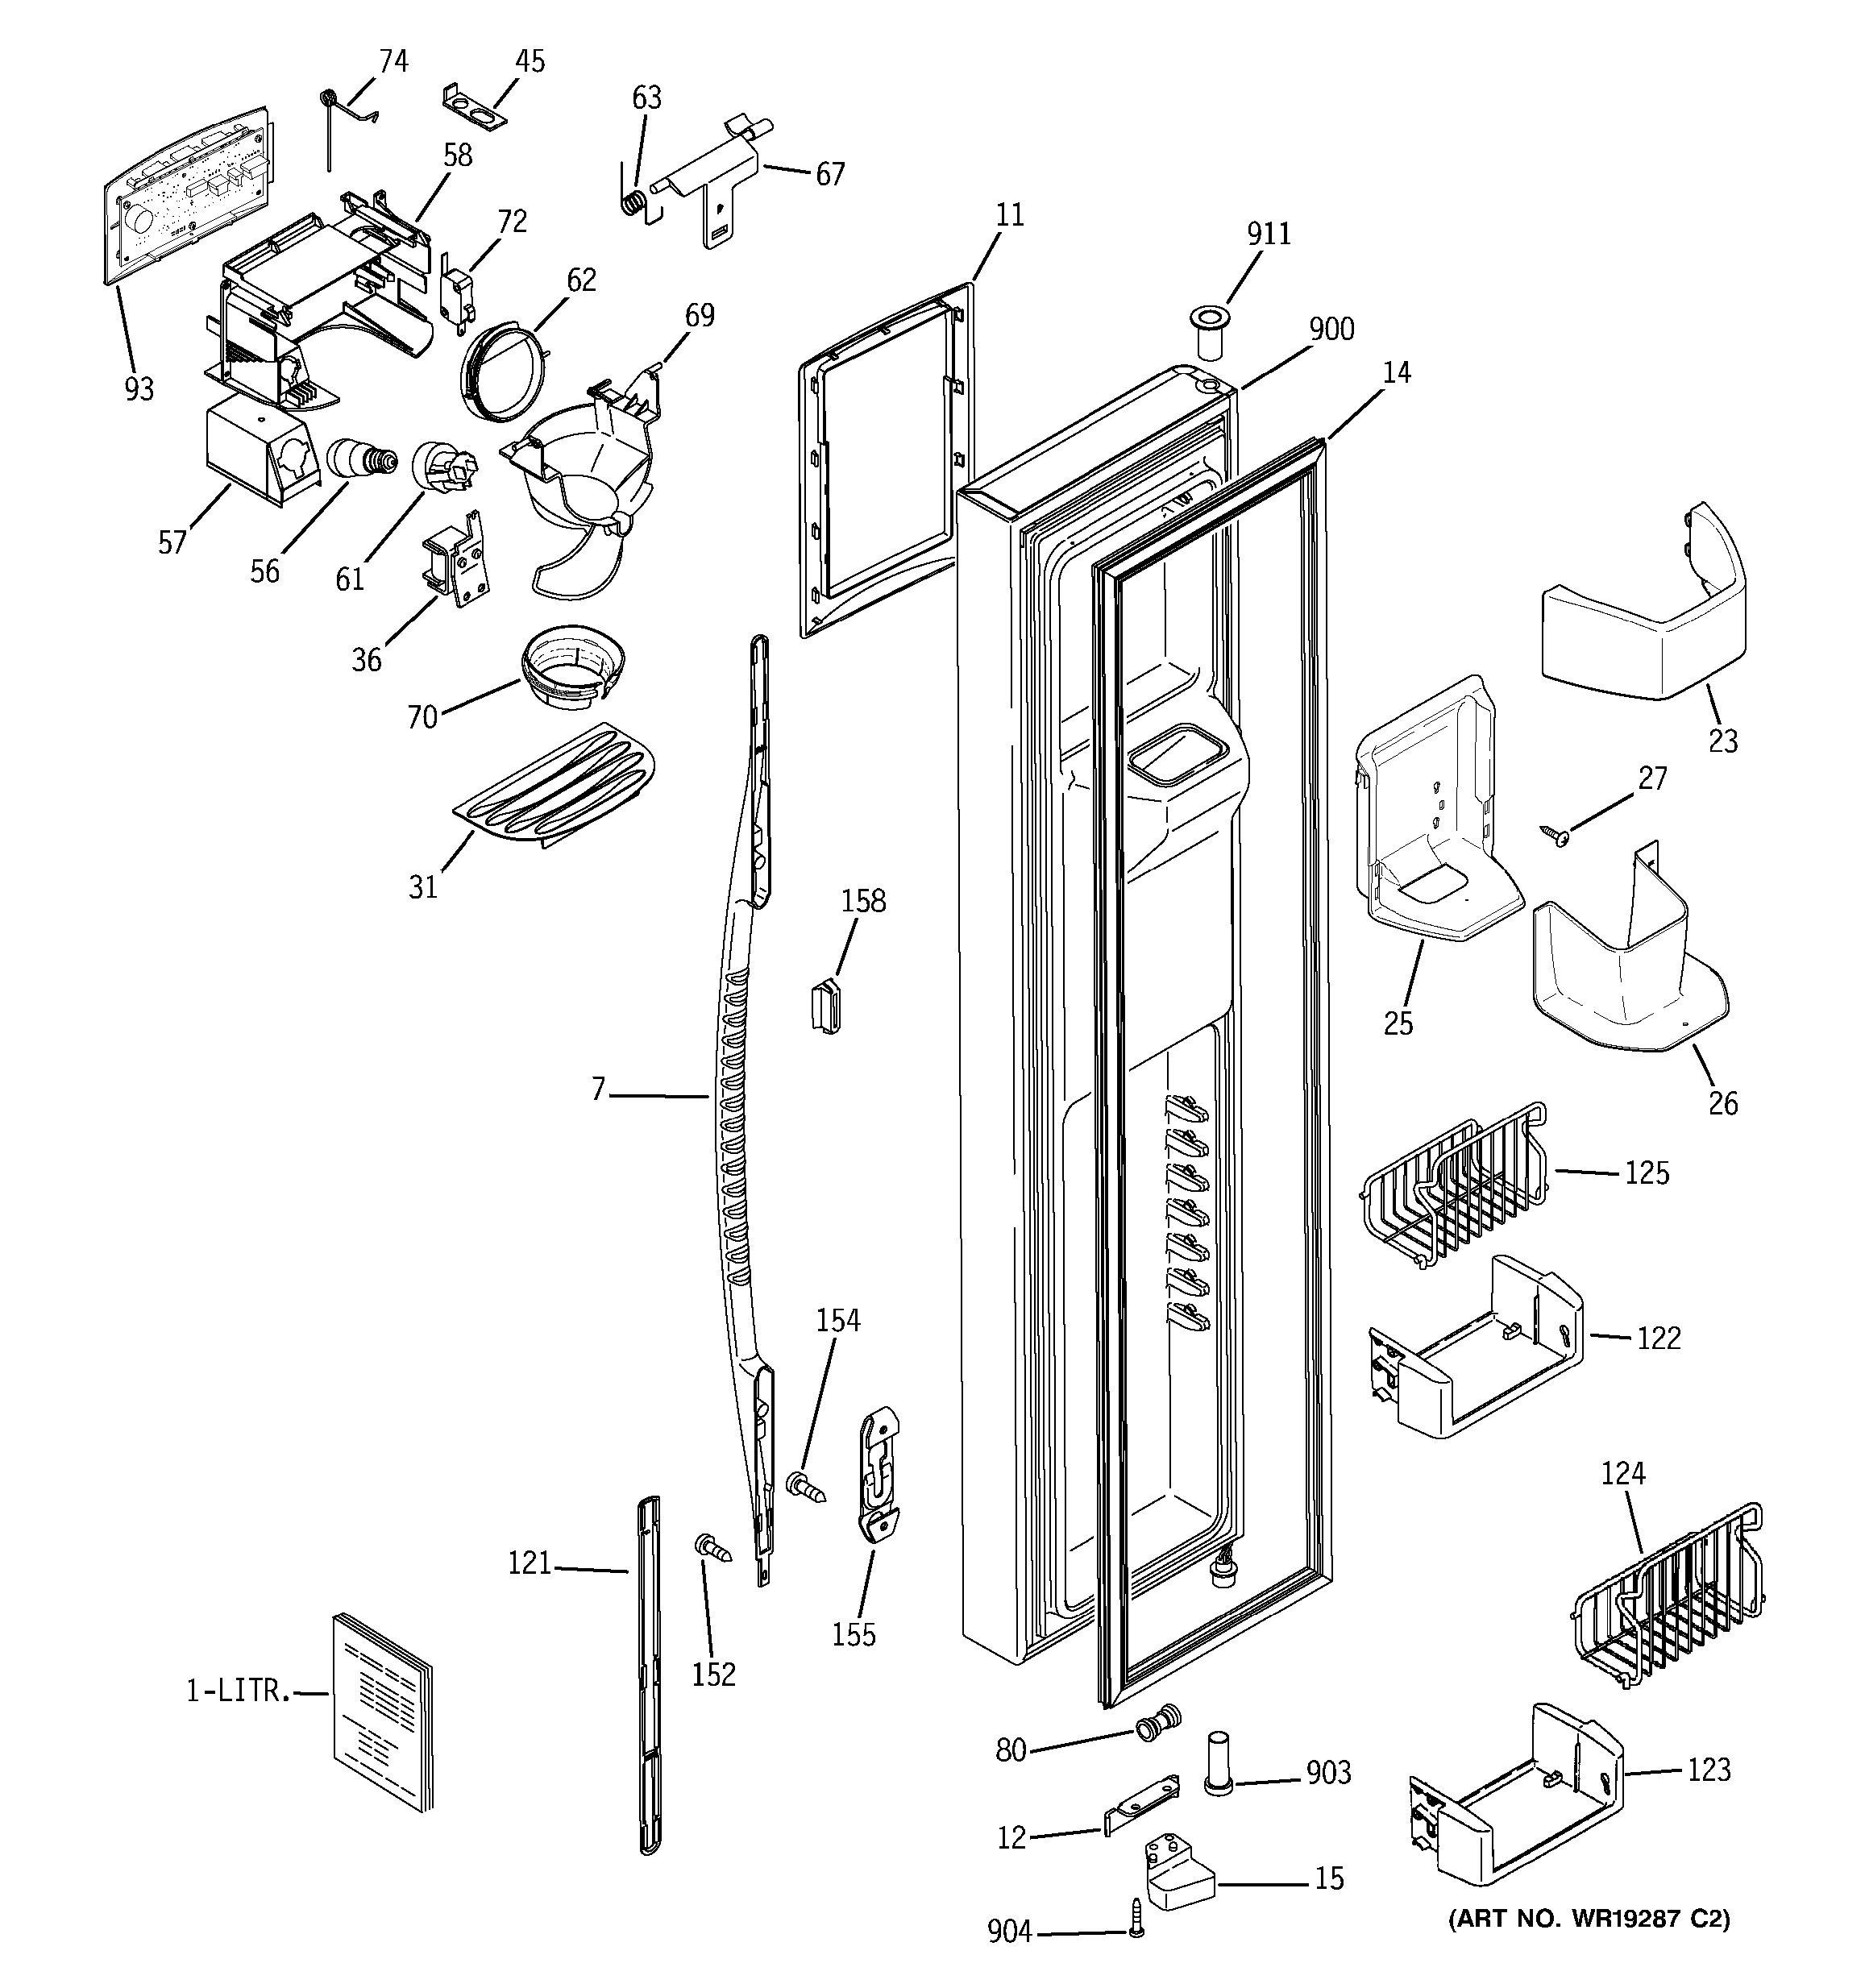 ge refrigerator diagram 1989 acura legend engine assembly view for freezer door pss26ngpbww